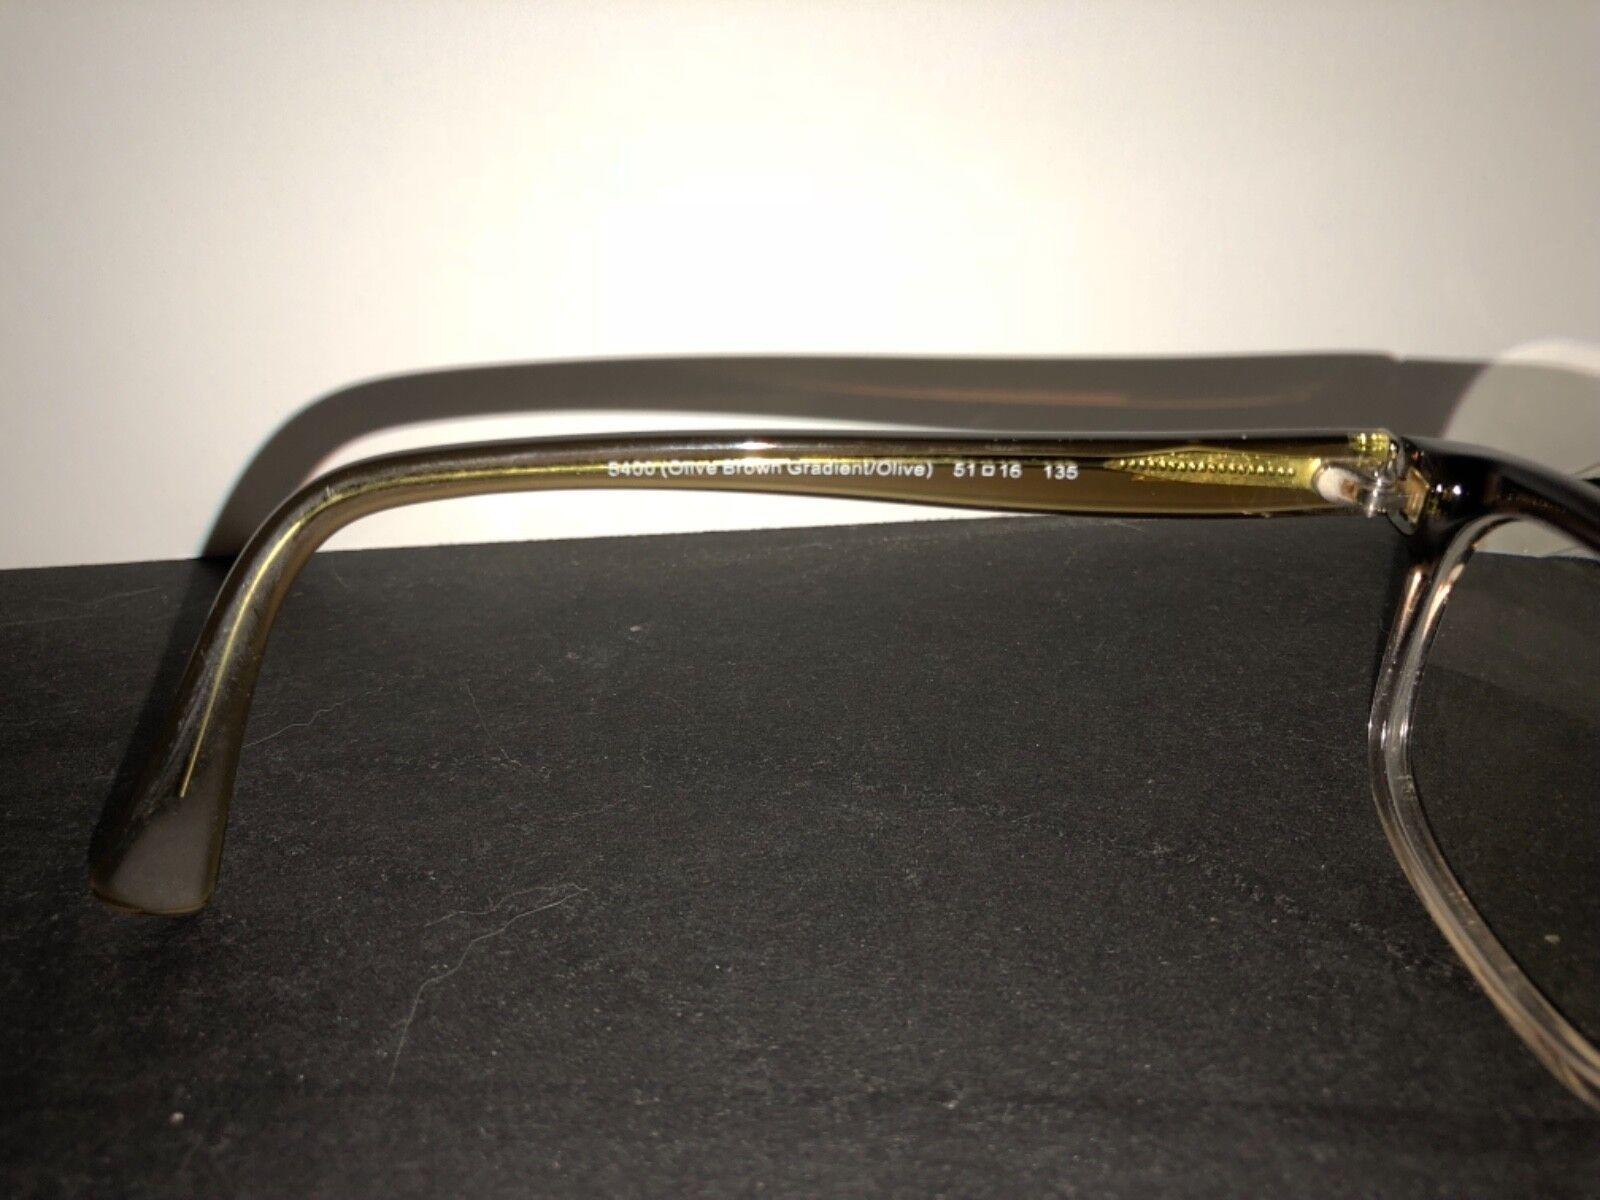 725326dea2 Coach Eyeglasses Hc6089 5400 Olive Brown Gradient olive 51mm for sale  online